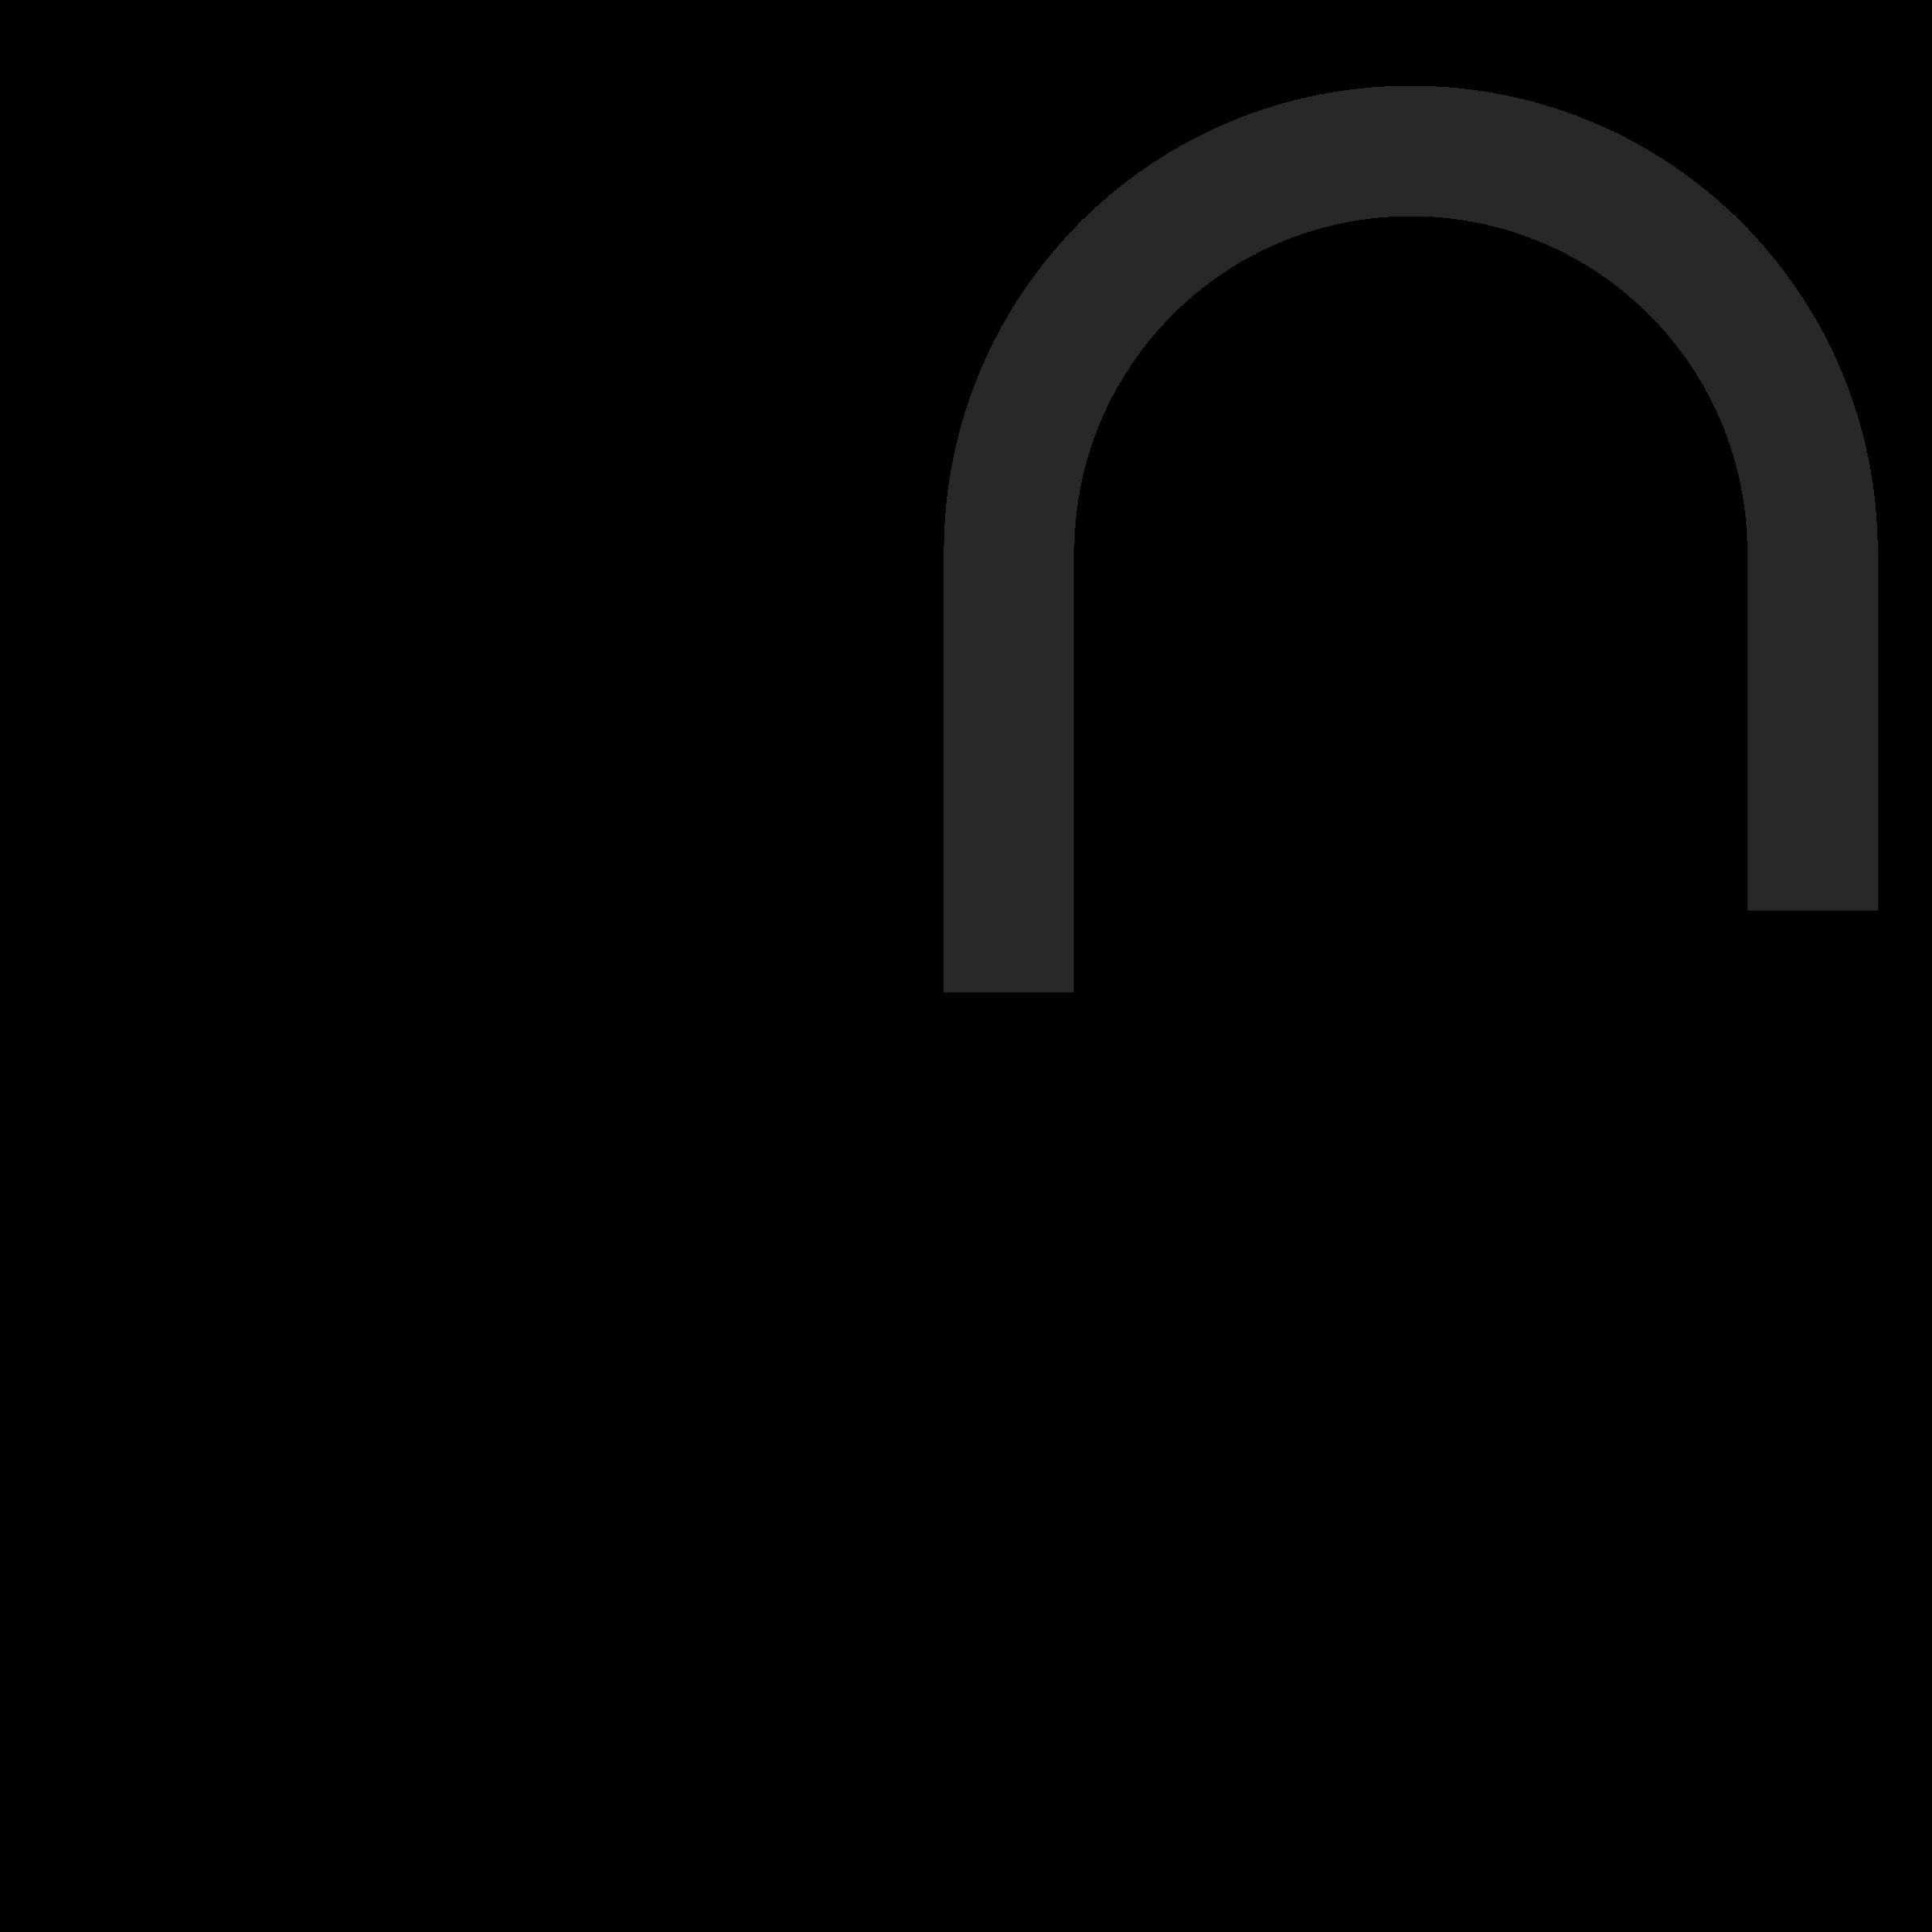 Silhou big image png. Padlock clipart unlocked padlock